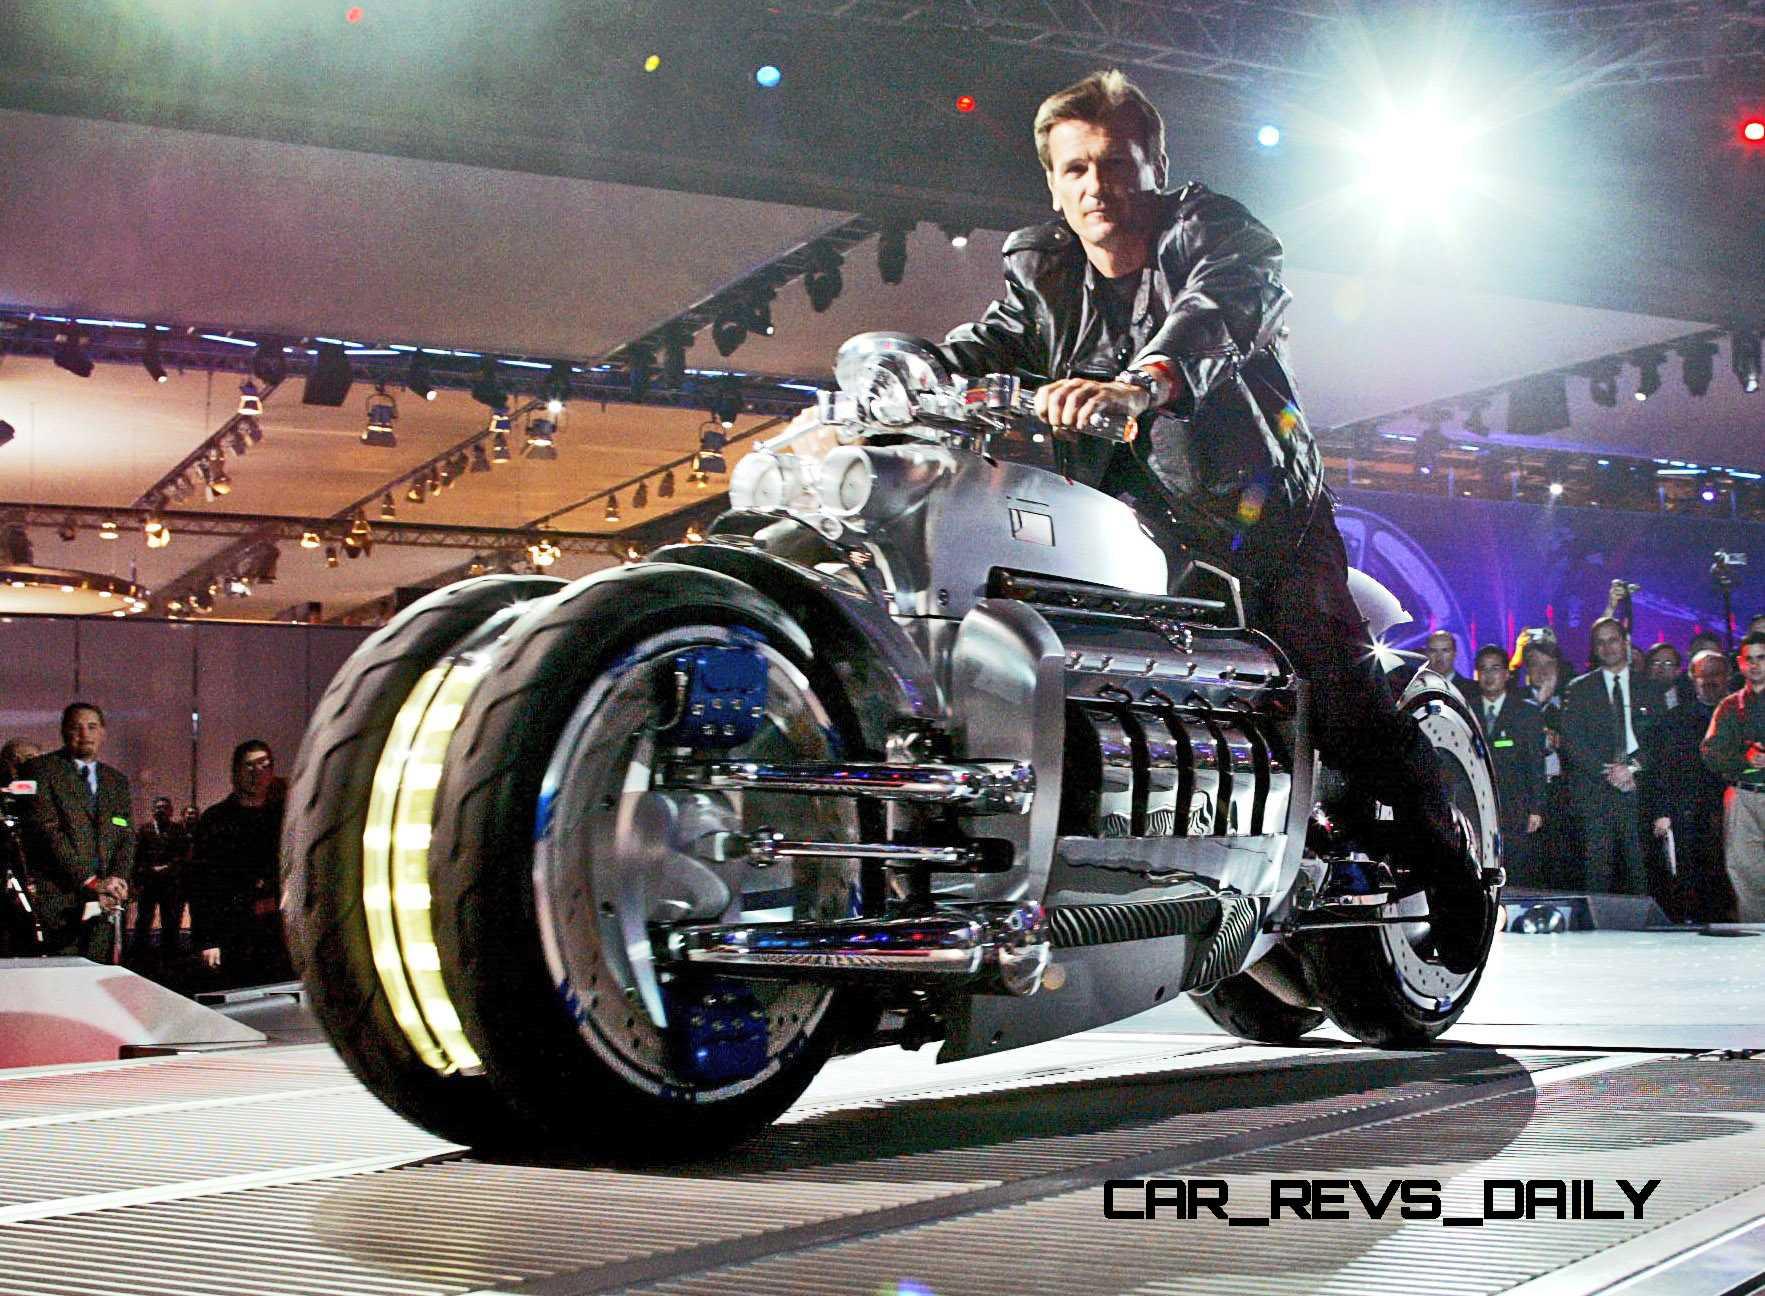 dodge tomahawk v10 superbike hd